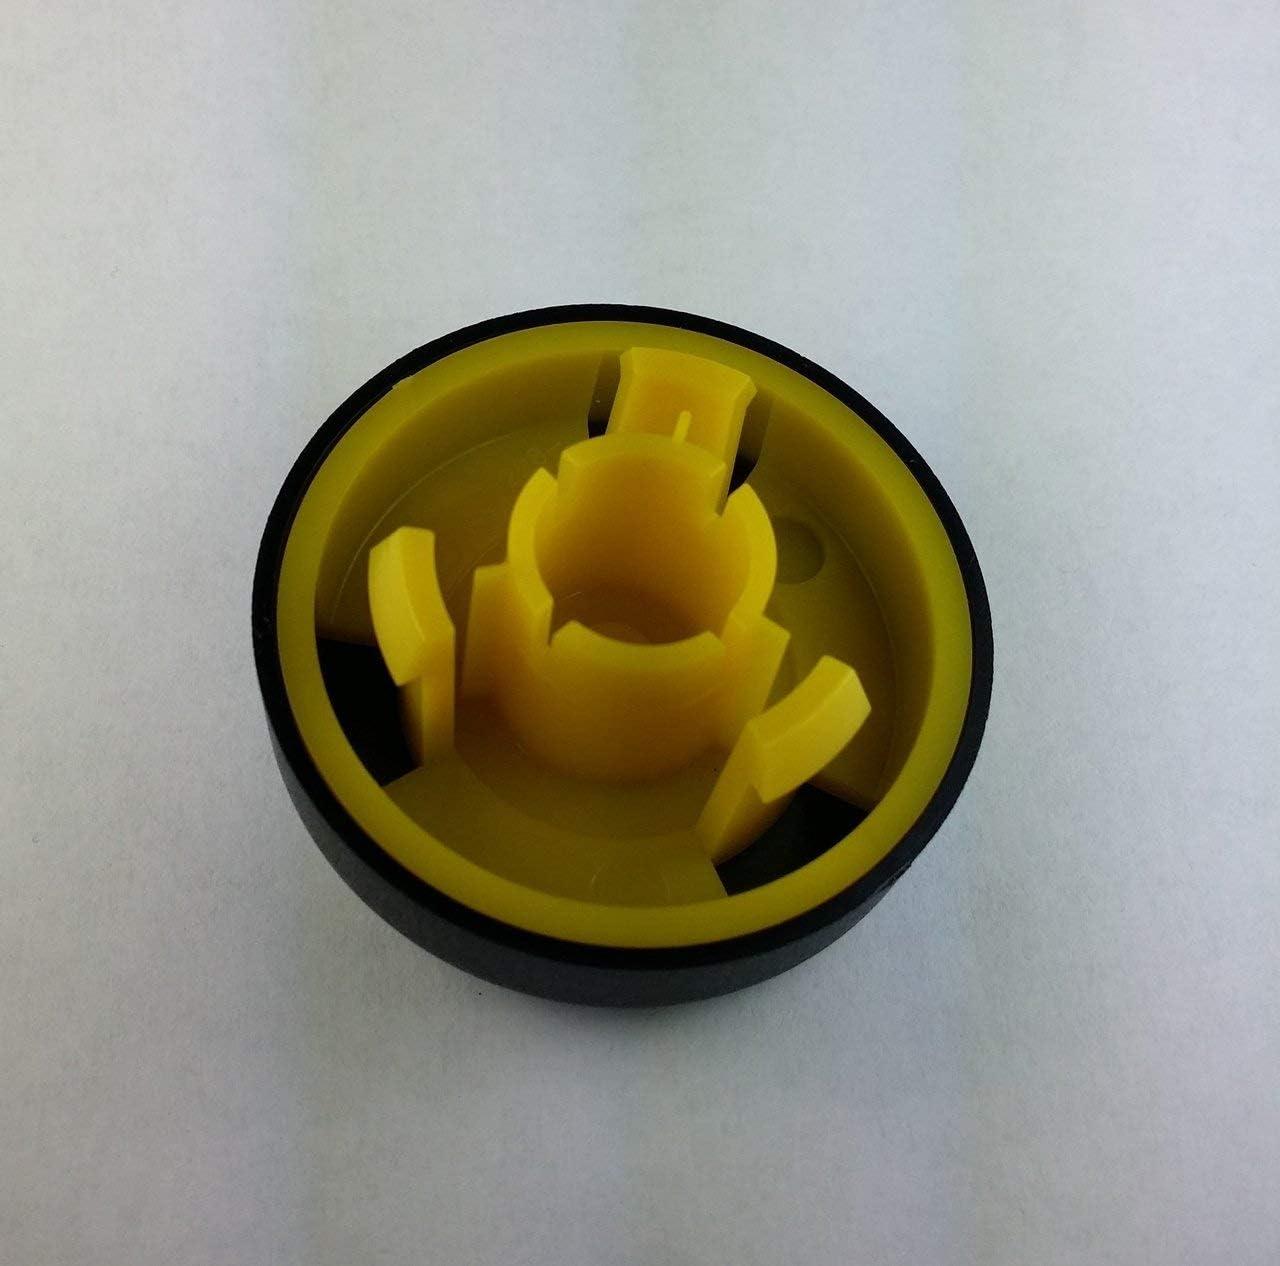 for Edge trolling motors Minn Kota Indicator yellow